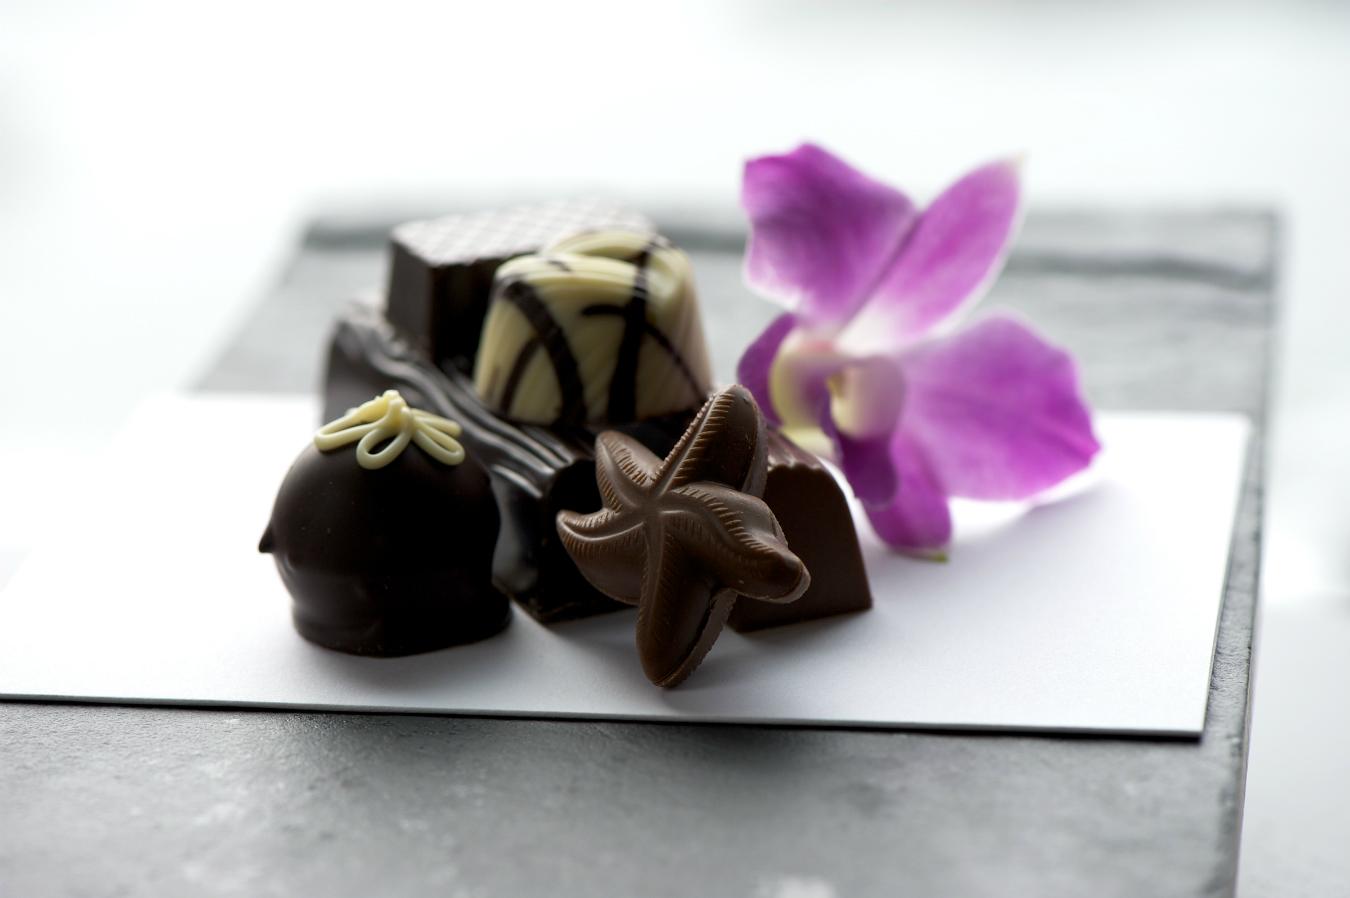 NUVO Daily Edit: Chocolate Tofino